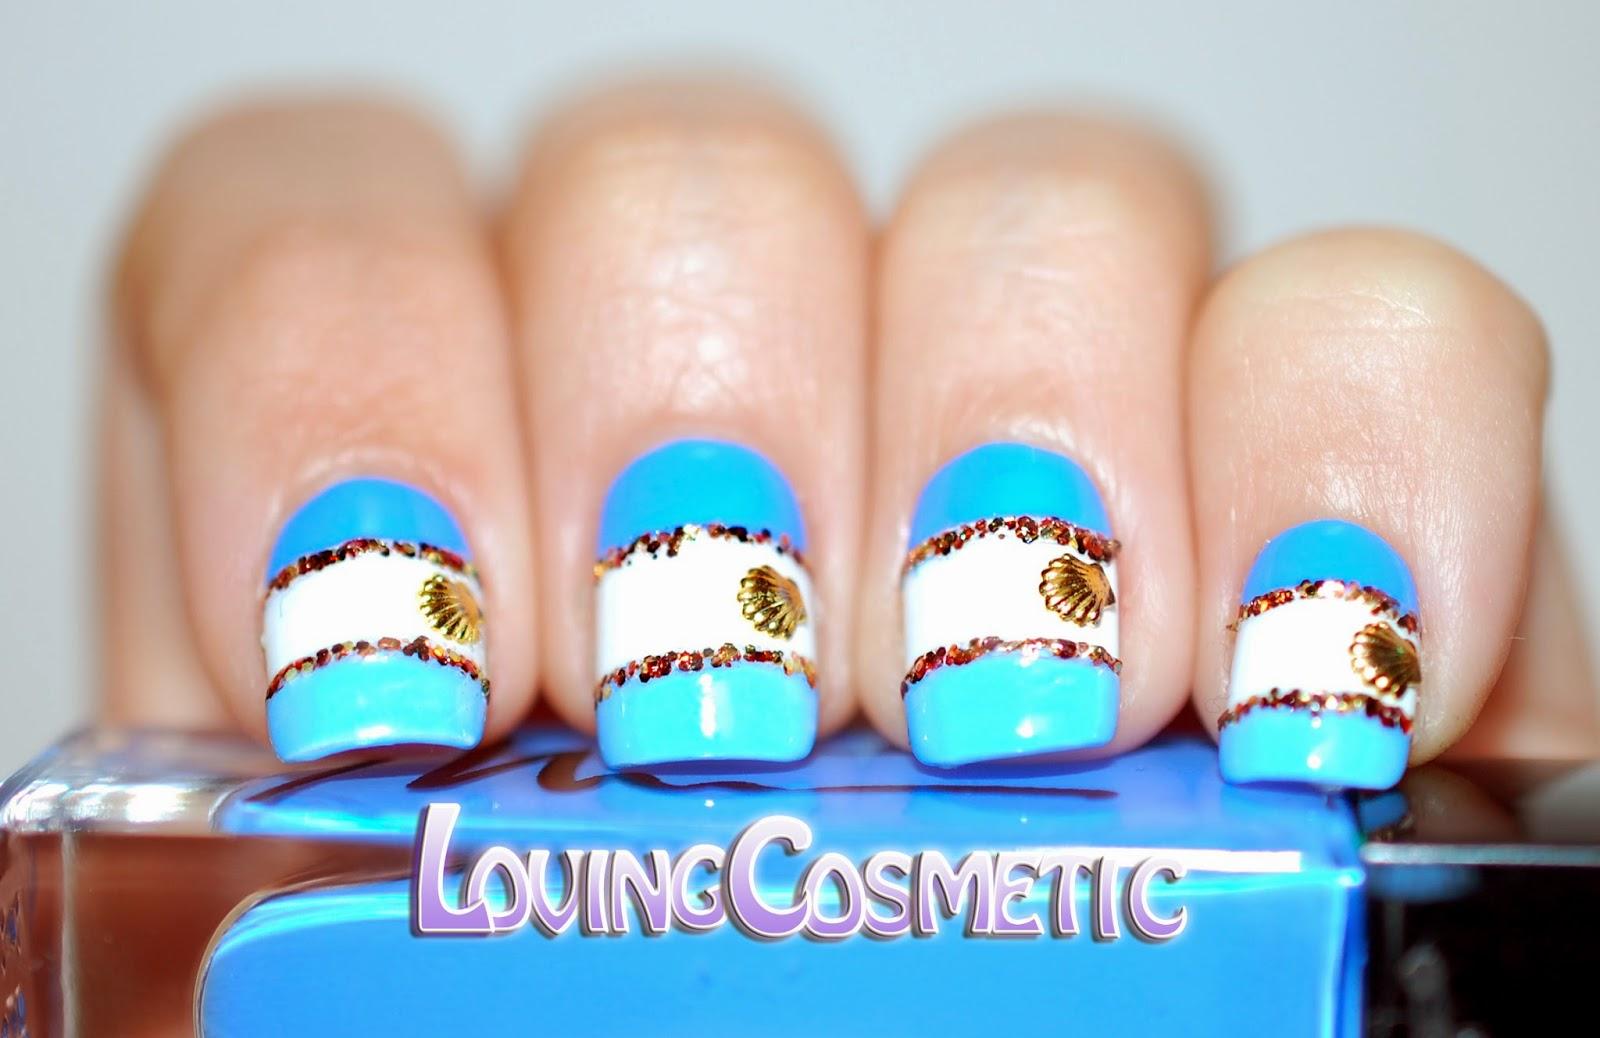 Nail Art Summer verano manicuras 2015 azul marionnaud bourjois facil